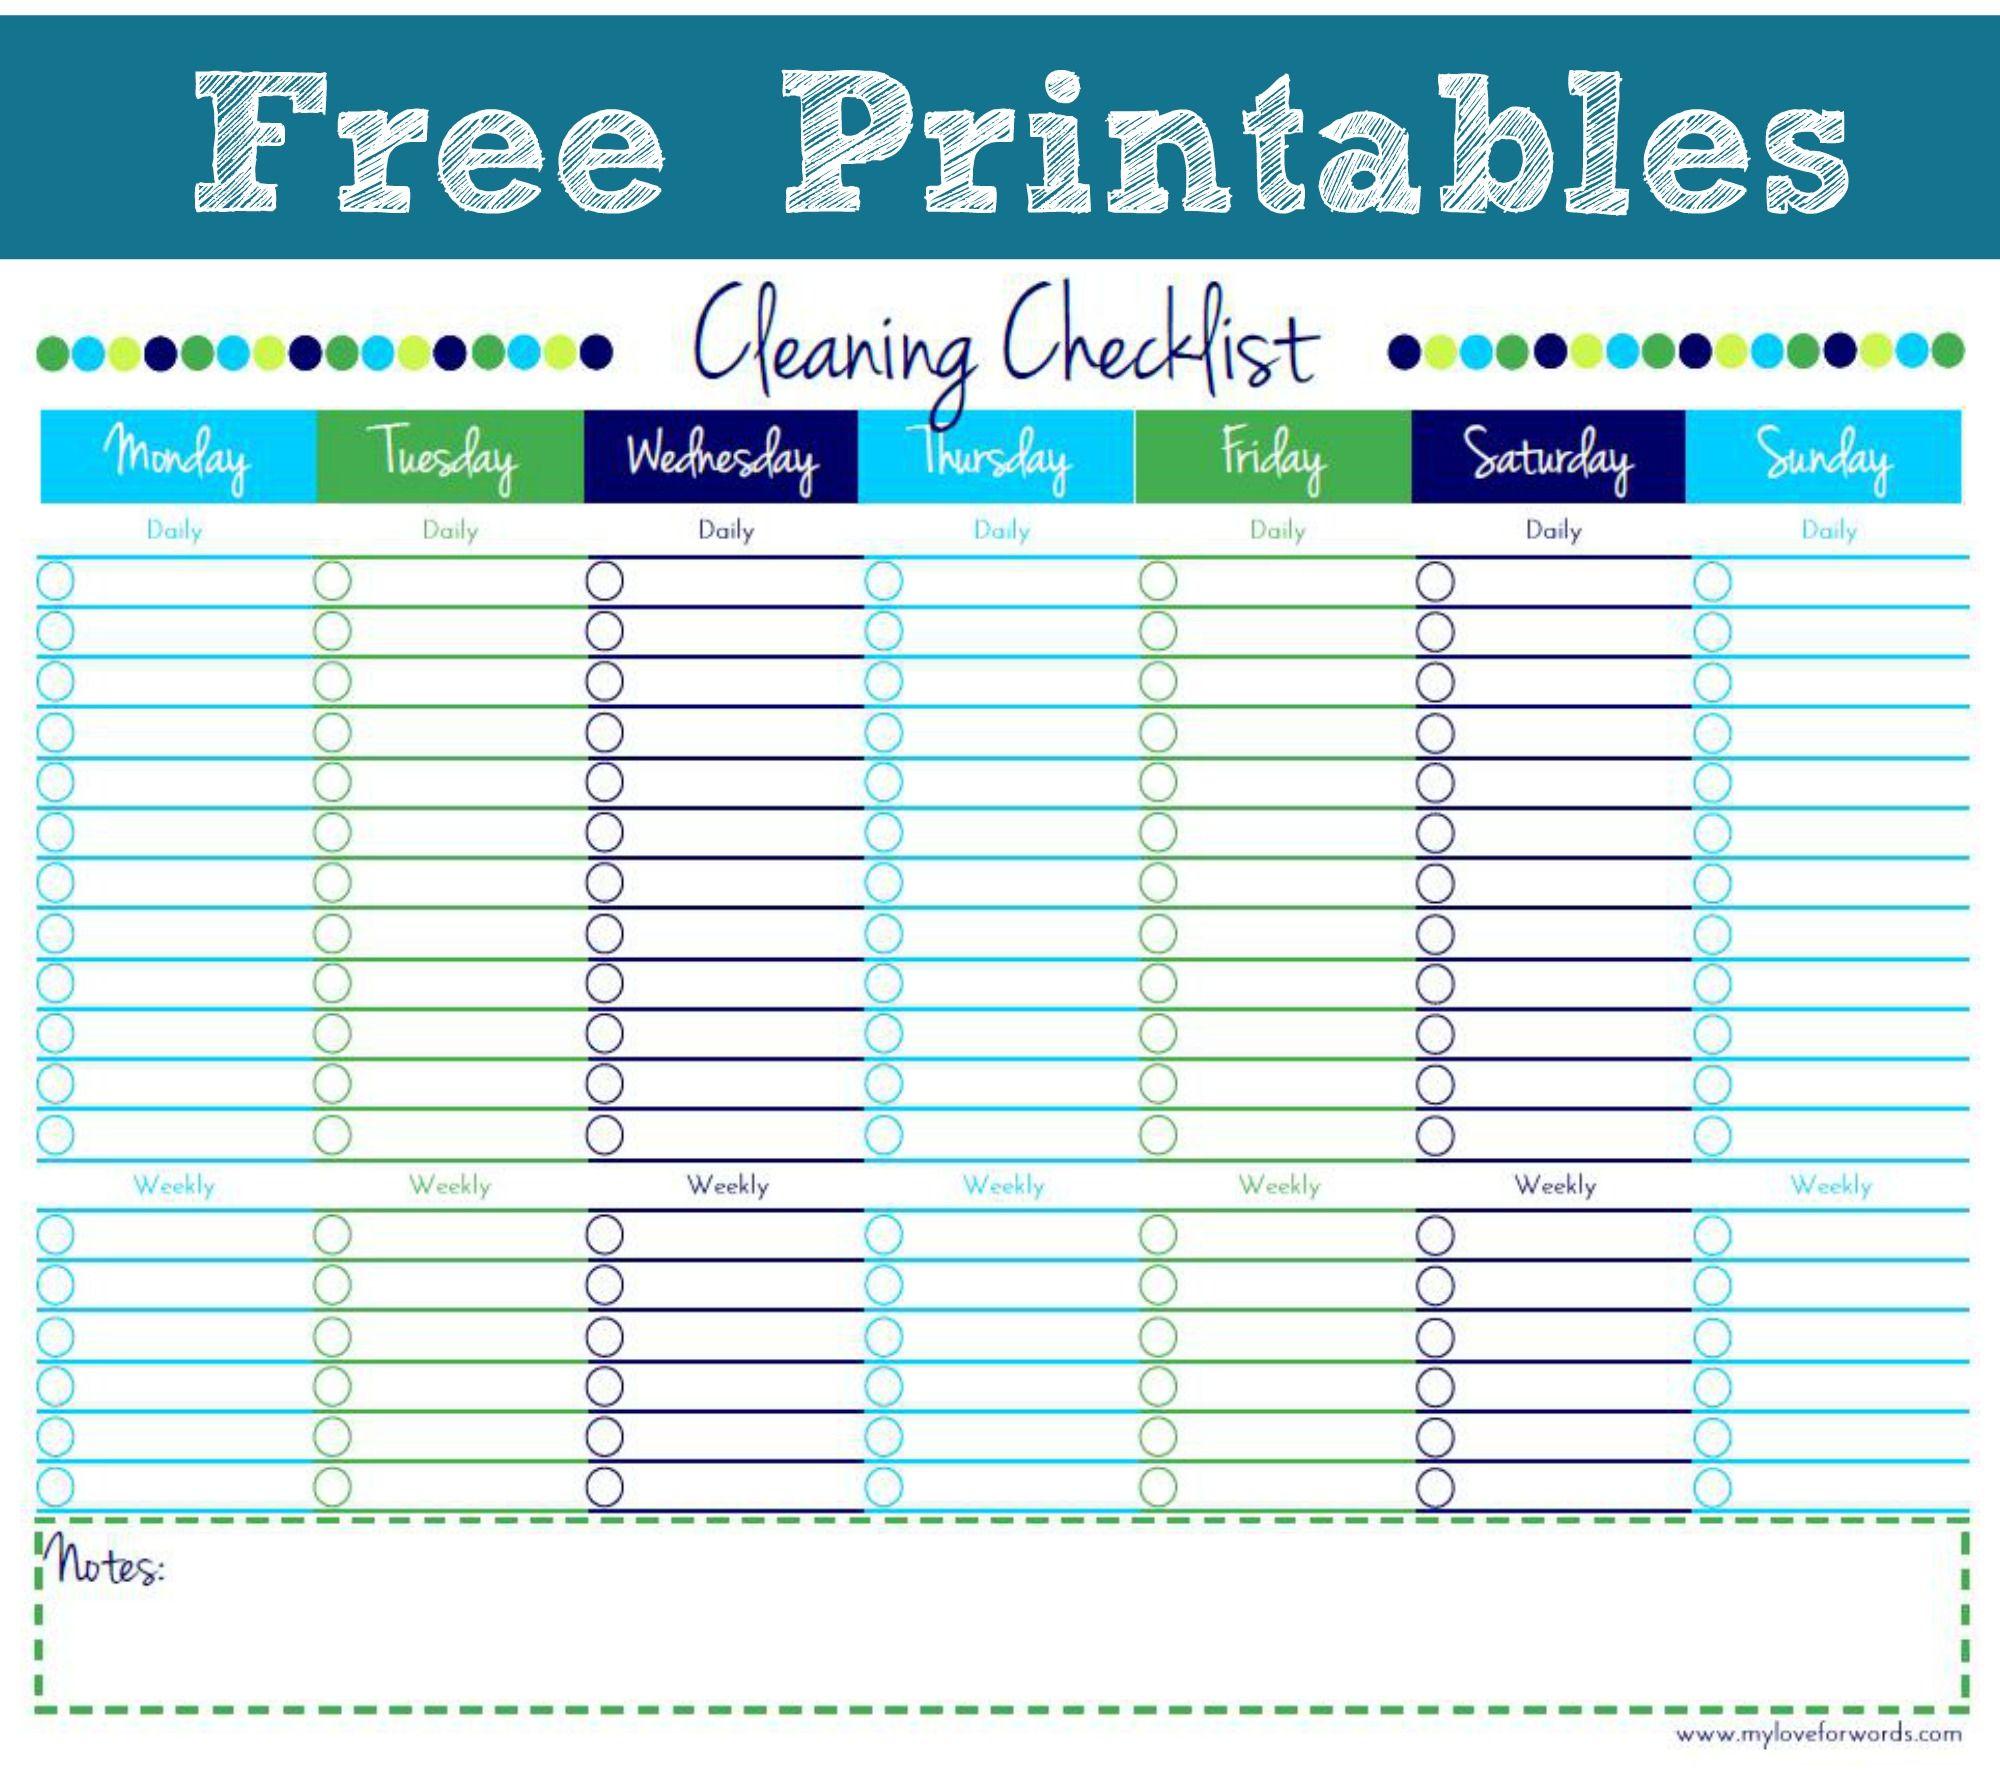 Checklist Template Free Doc585600 Word Checklist Templates – Daily Checklist Template Word